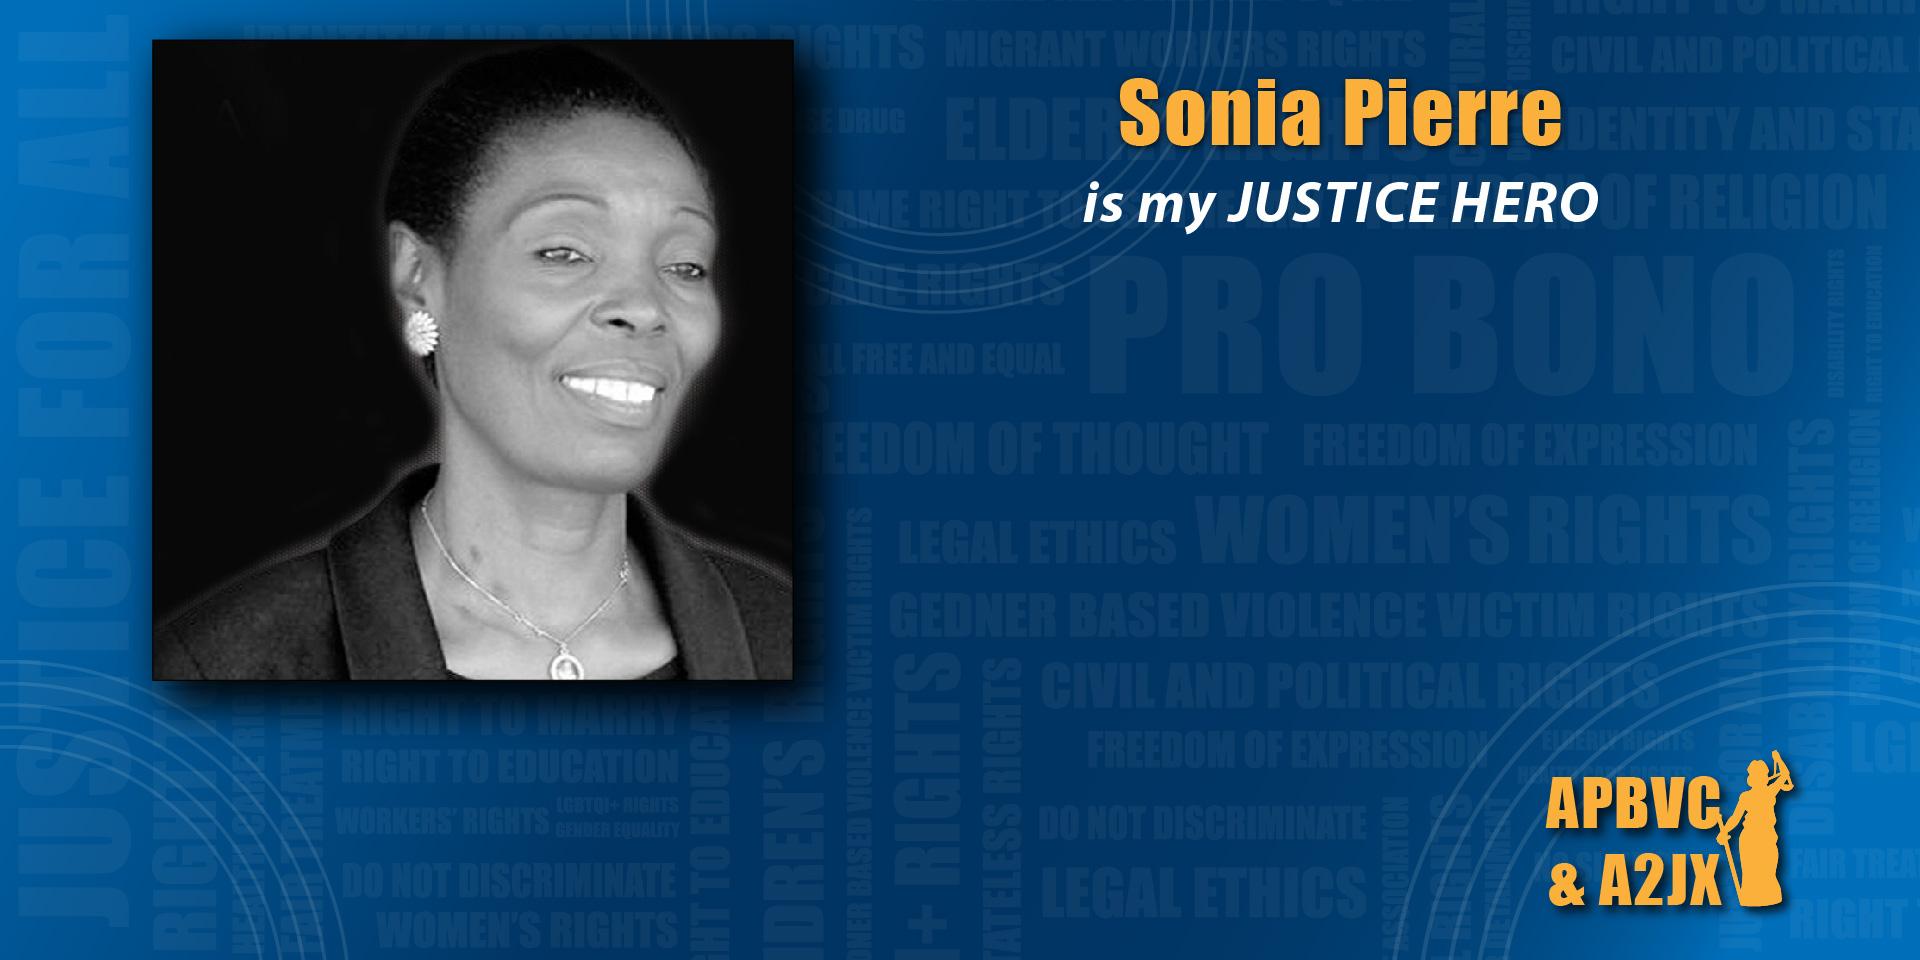 Sonia Pierre